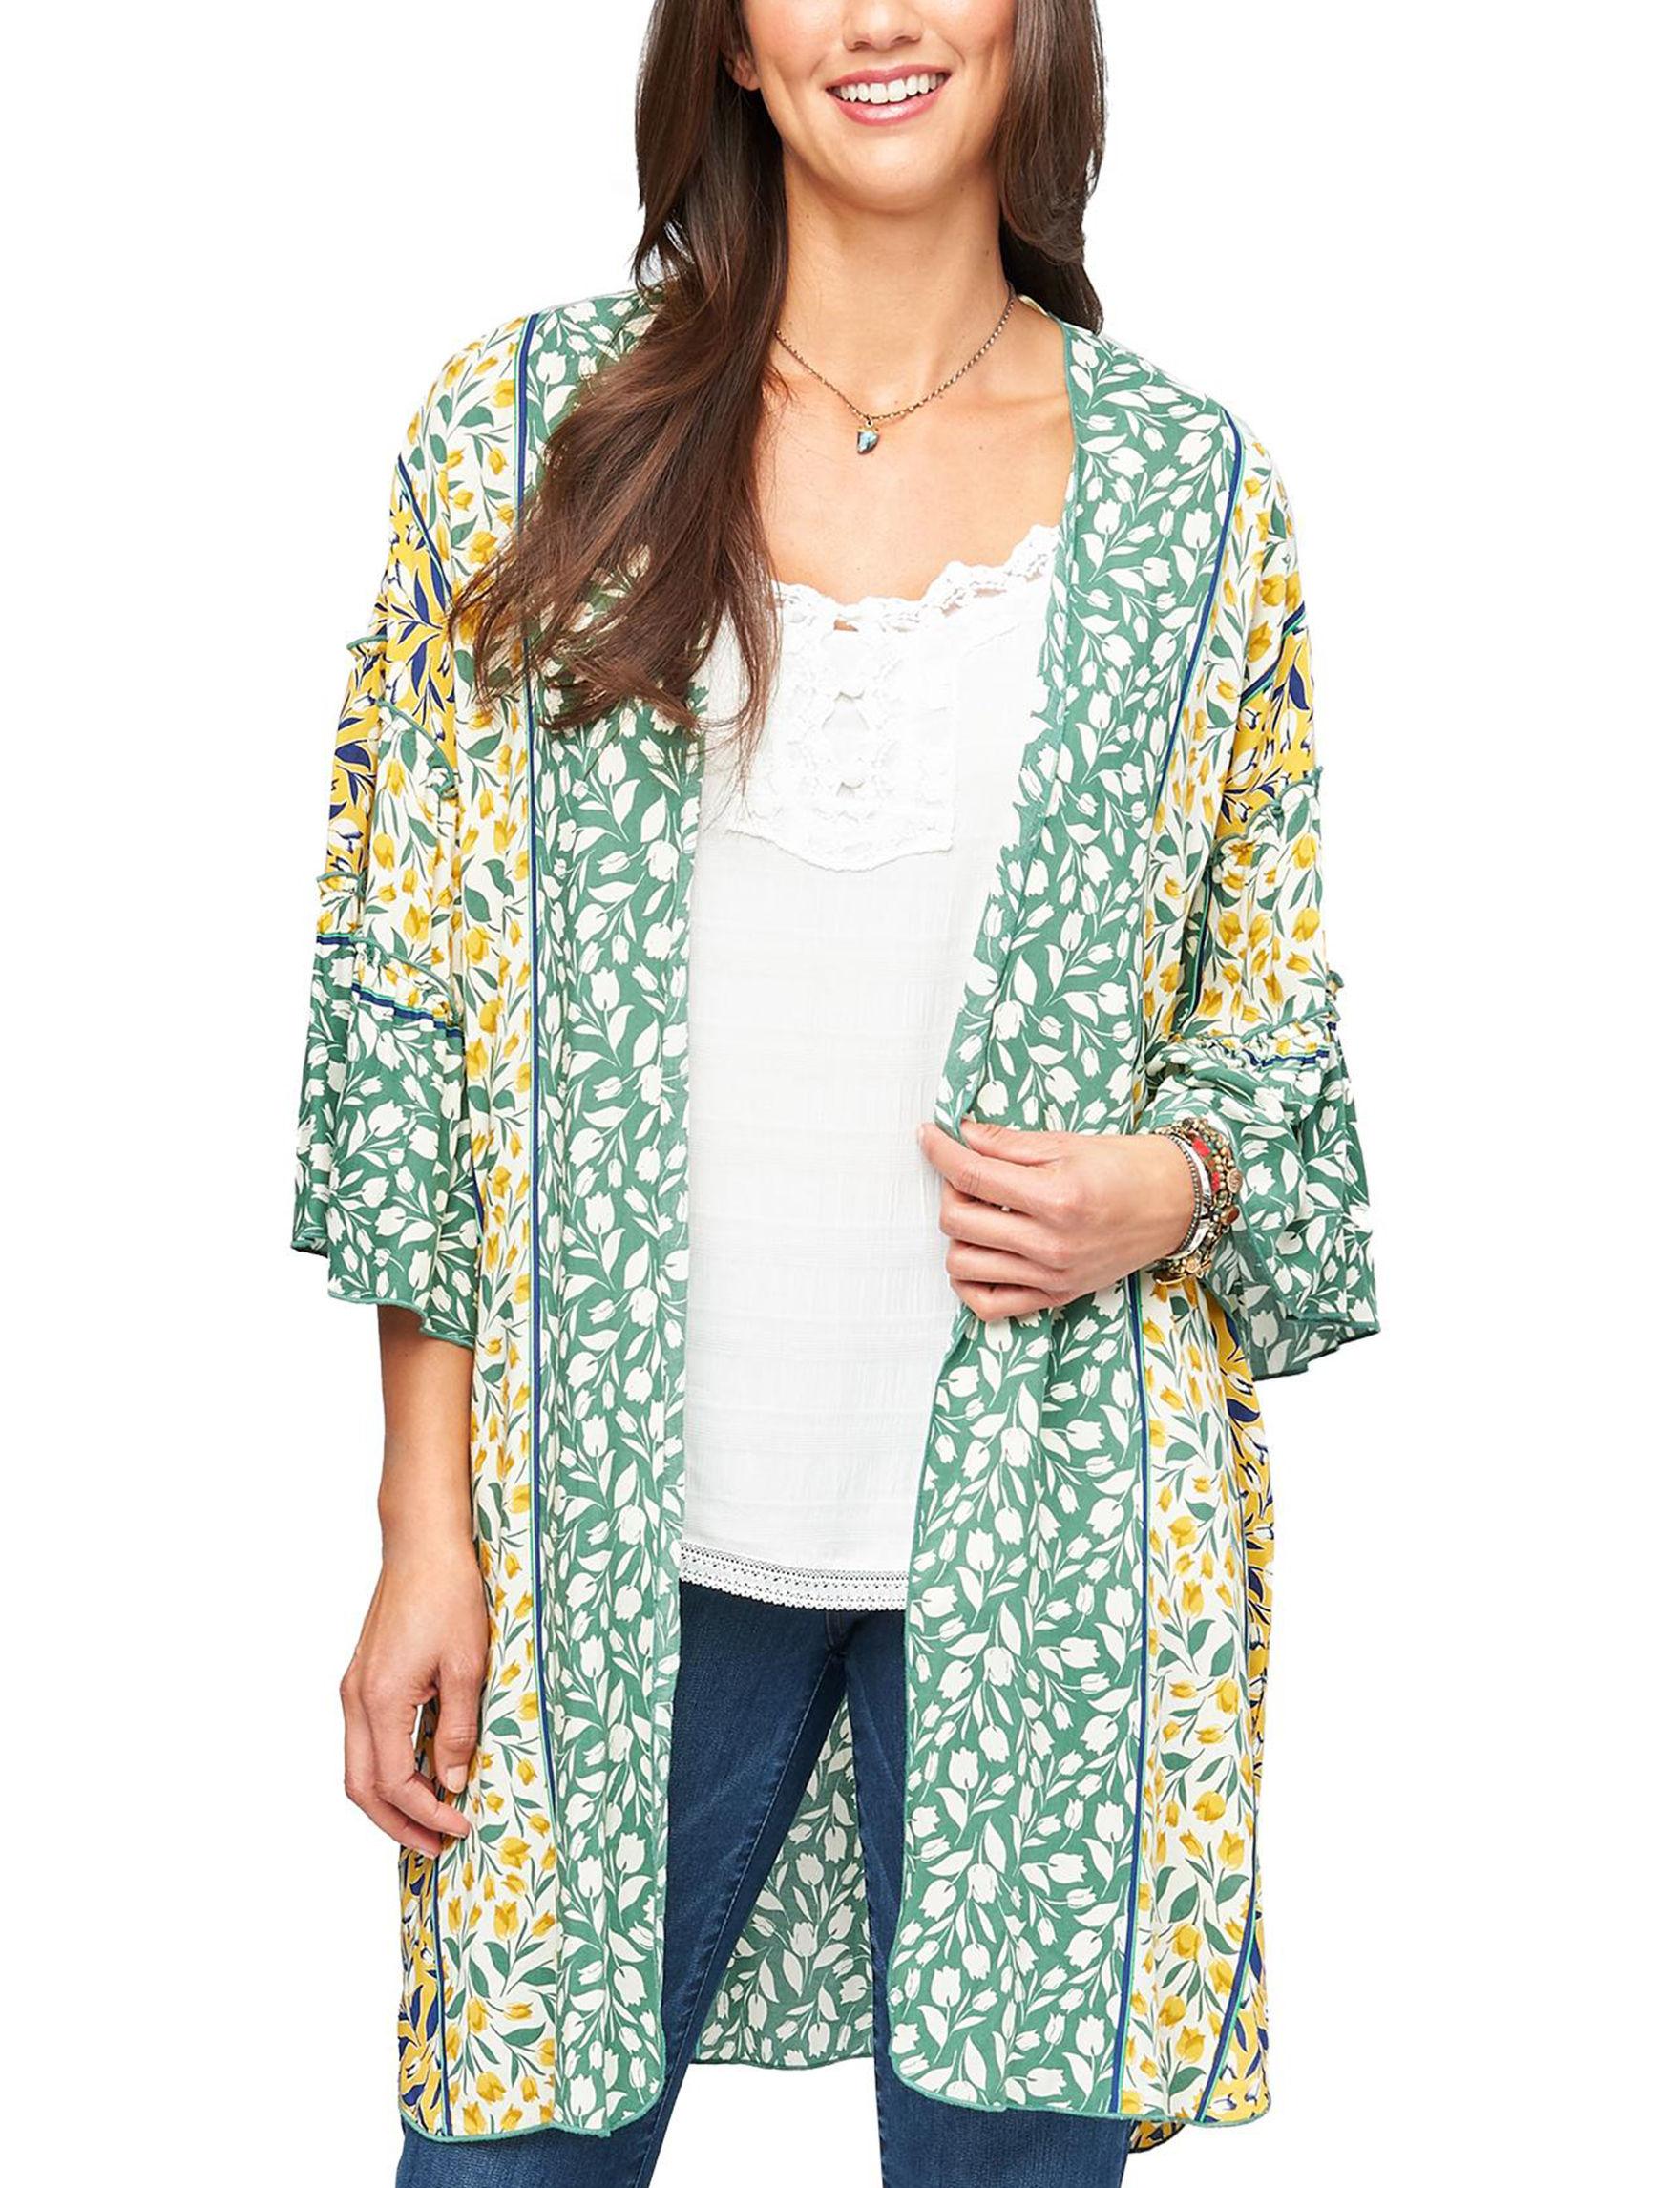 Democracy Green Kimonos & Toppers